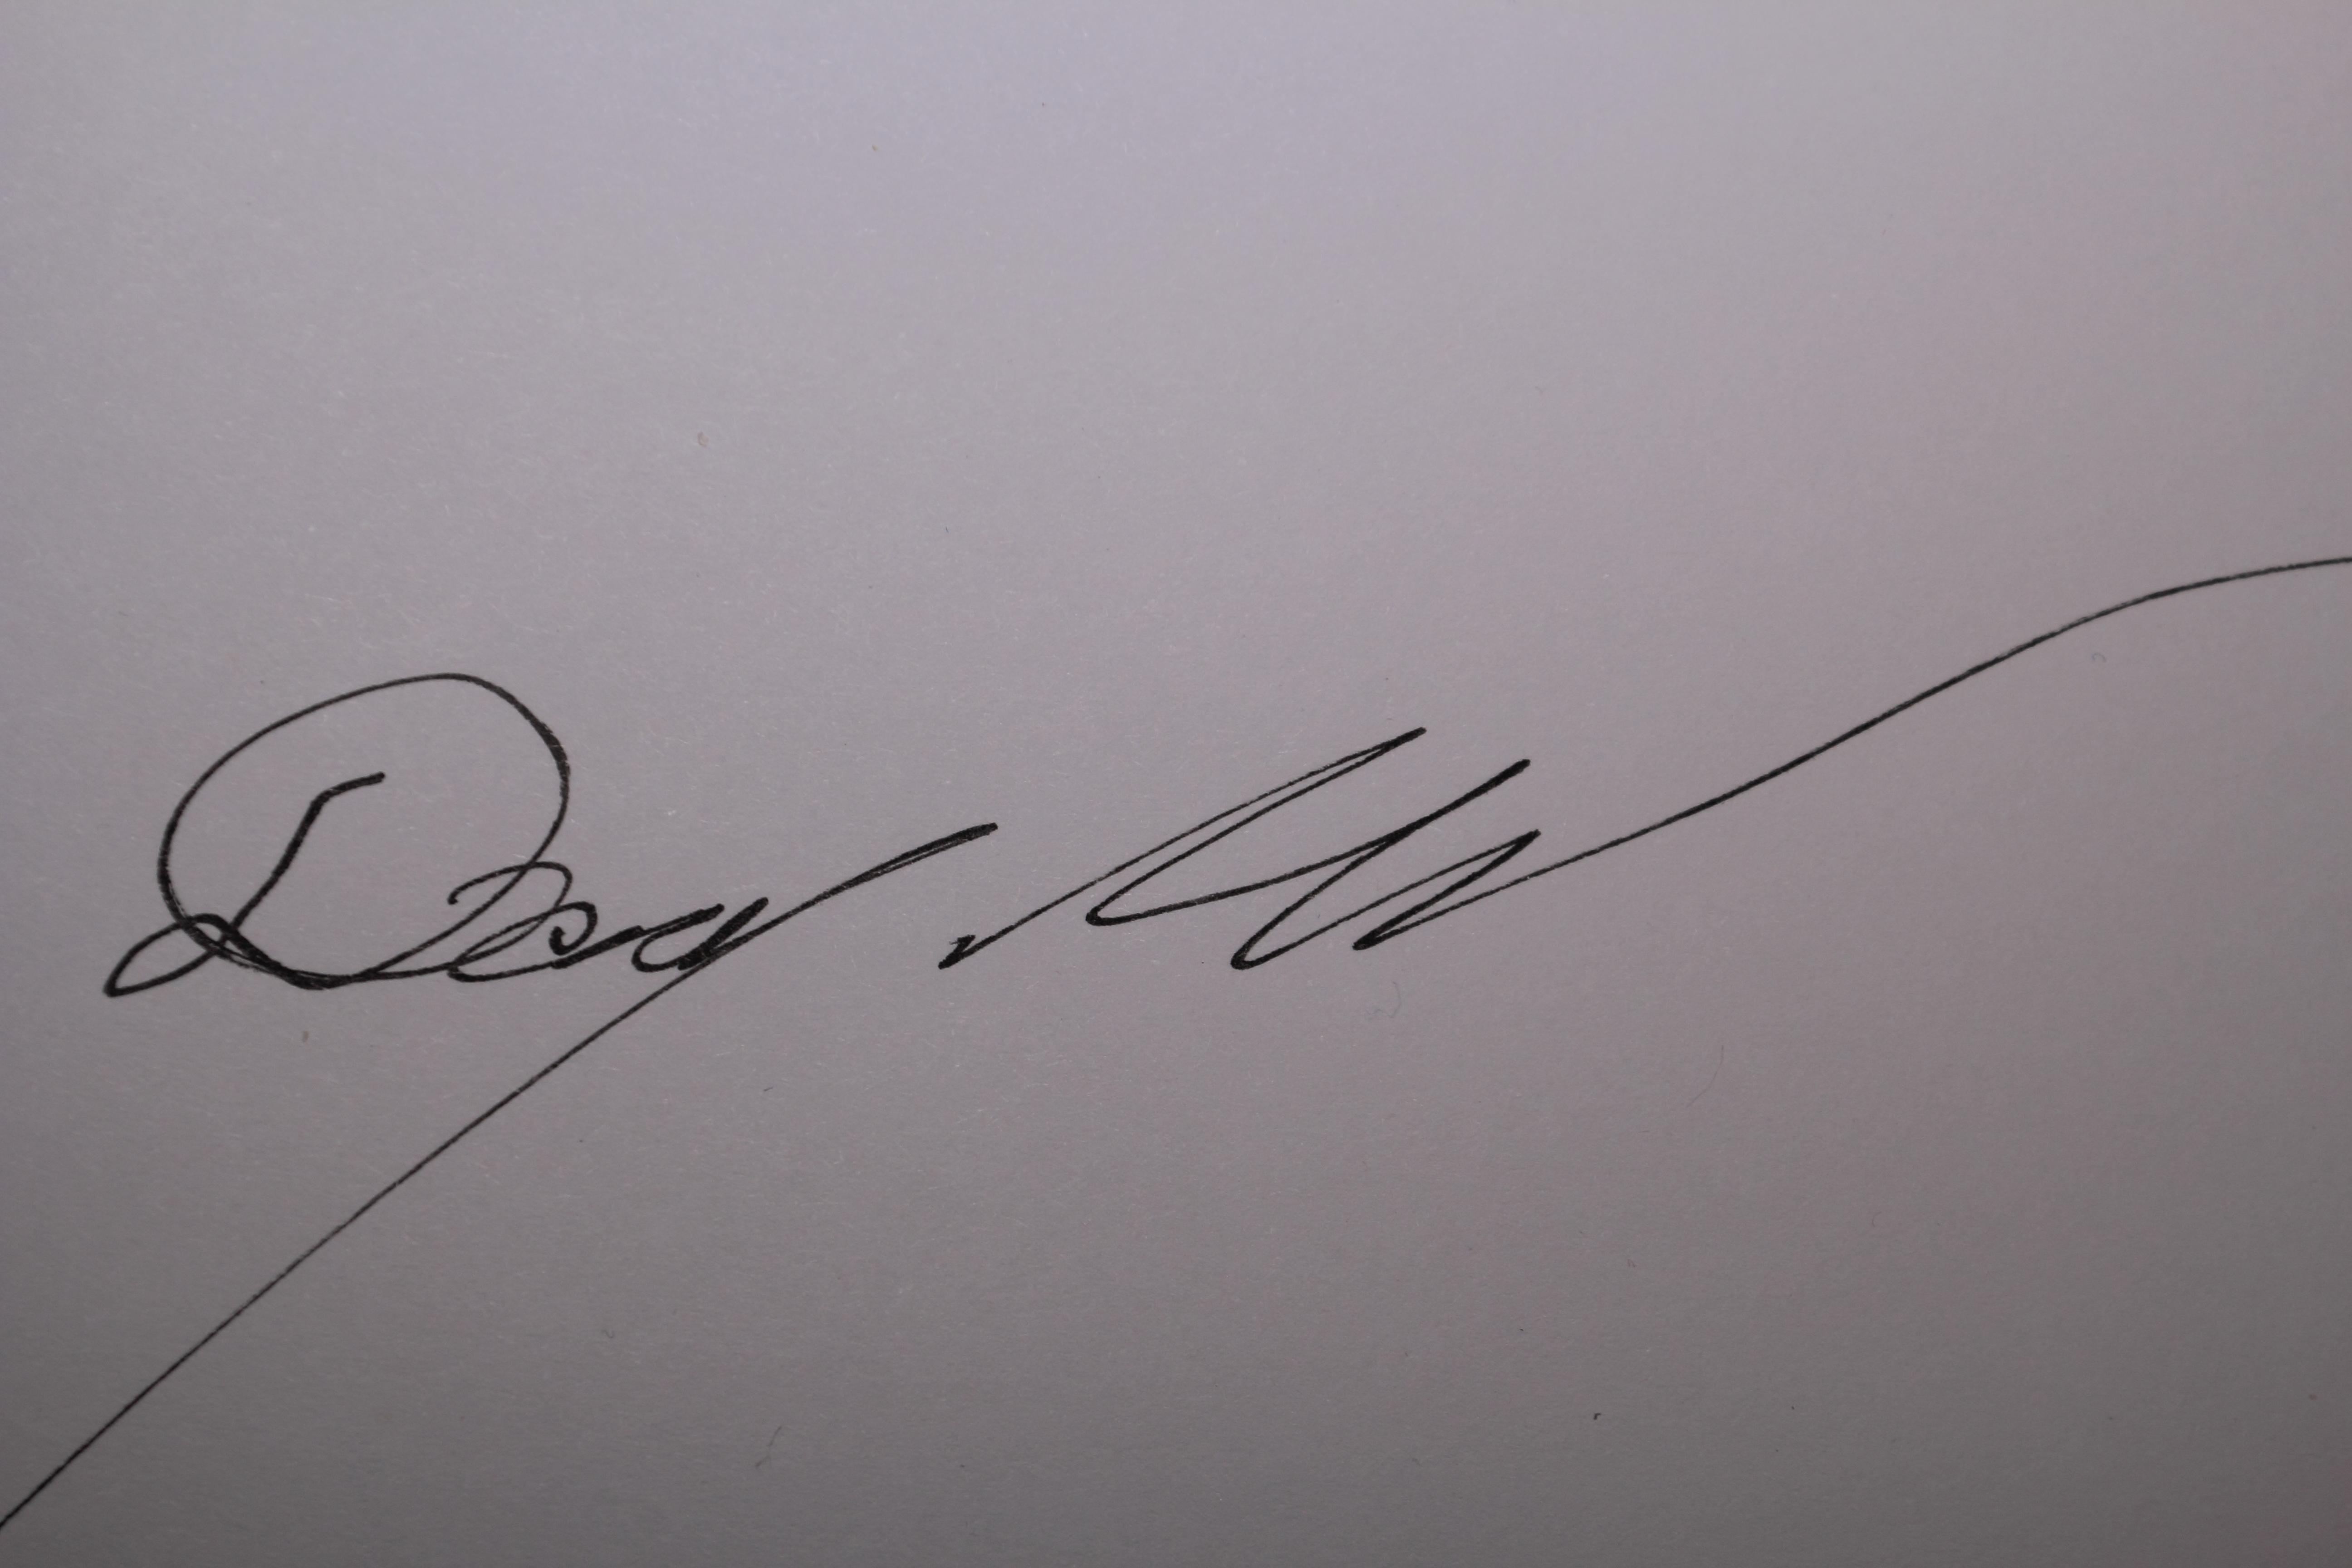 Doug Mills's Signature